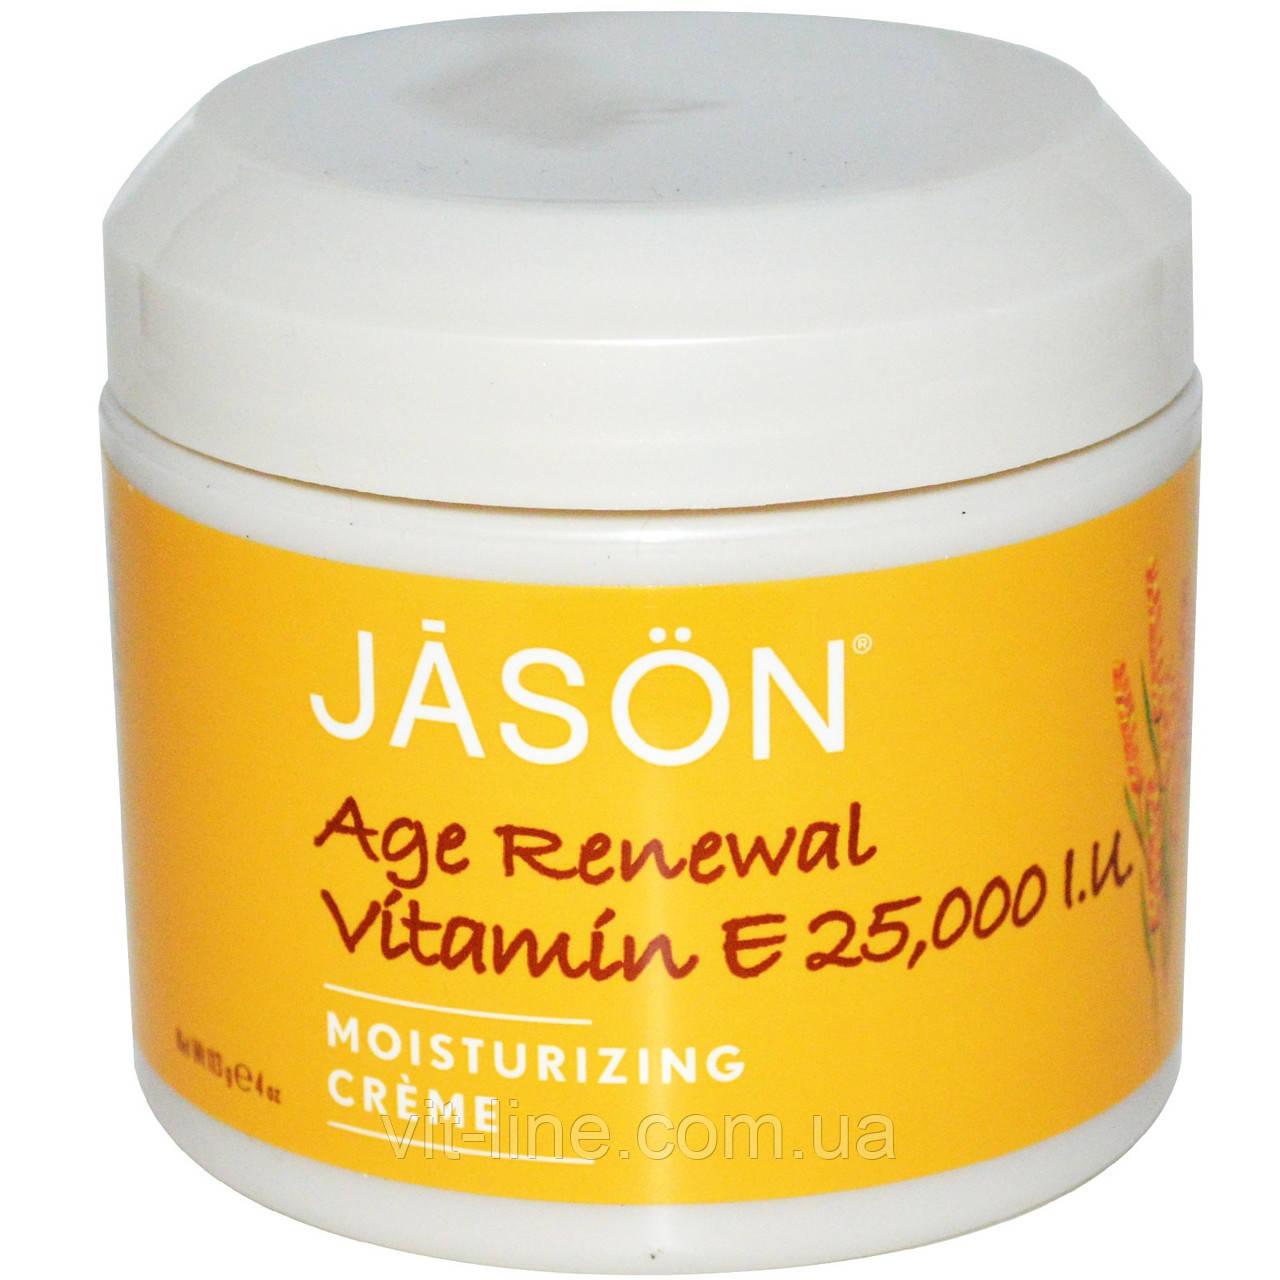 Jason Natural, Age Renewal Vitamin E, Увлажняющий крем, 25 000 МЕ (113 г)